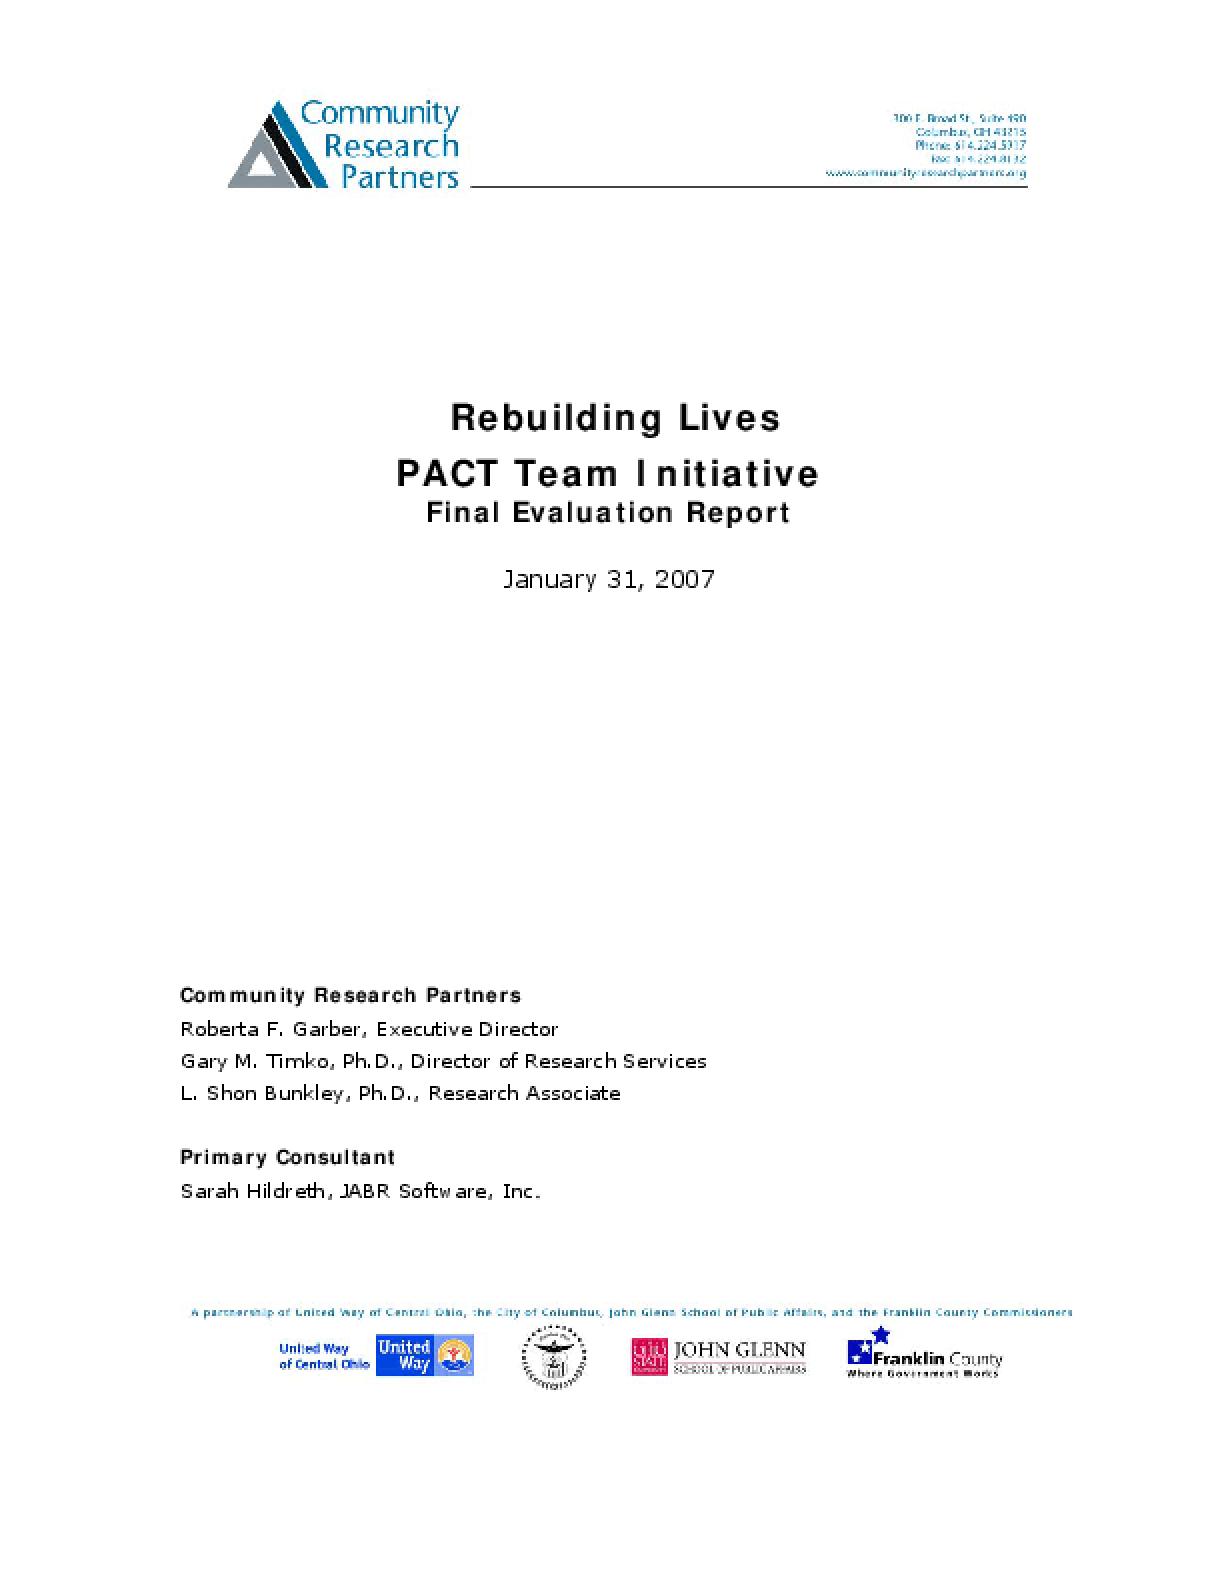 Rebuilding Lives PACT Team Initiative Evaluation